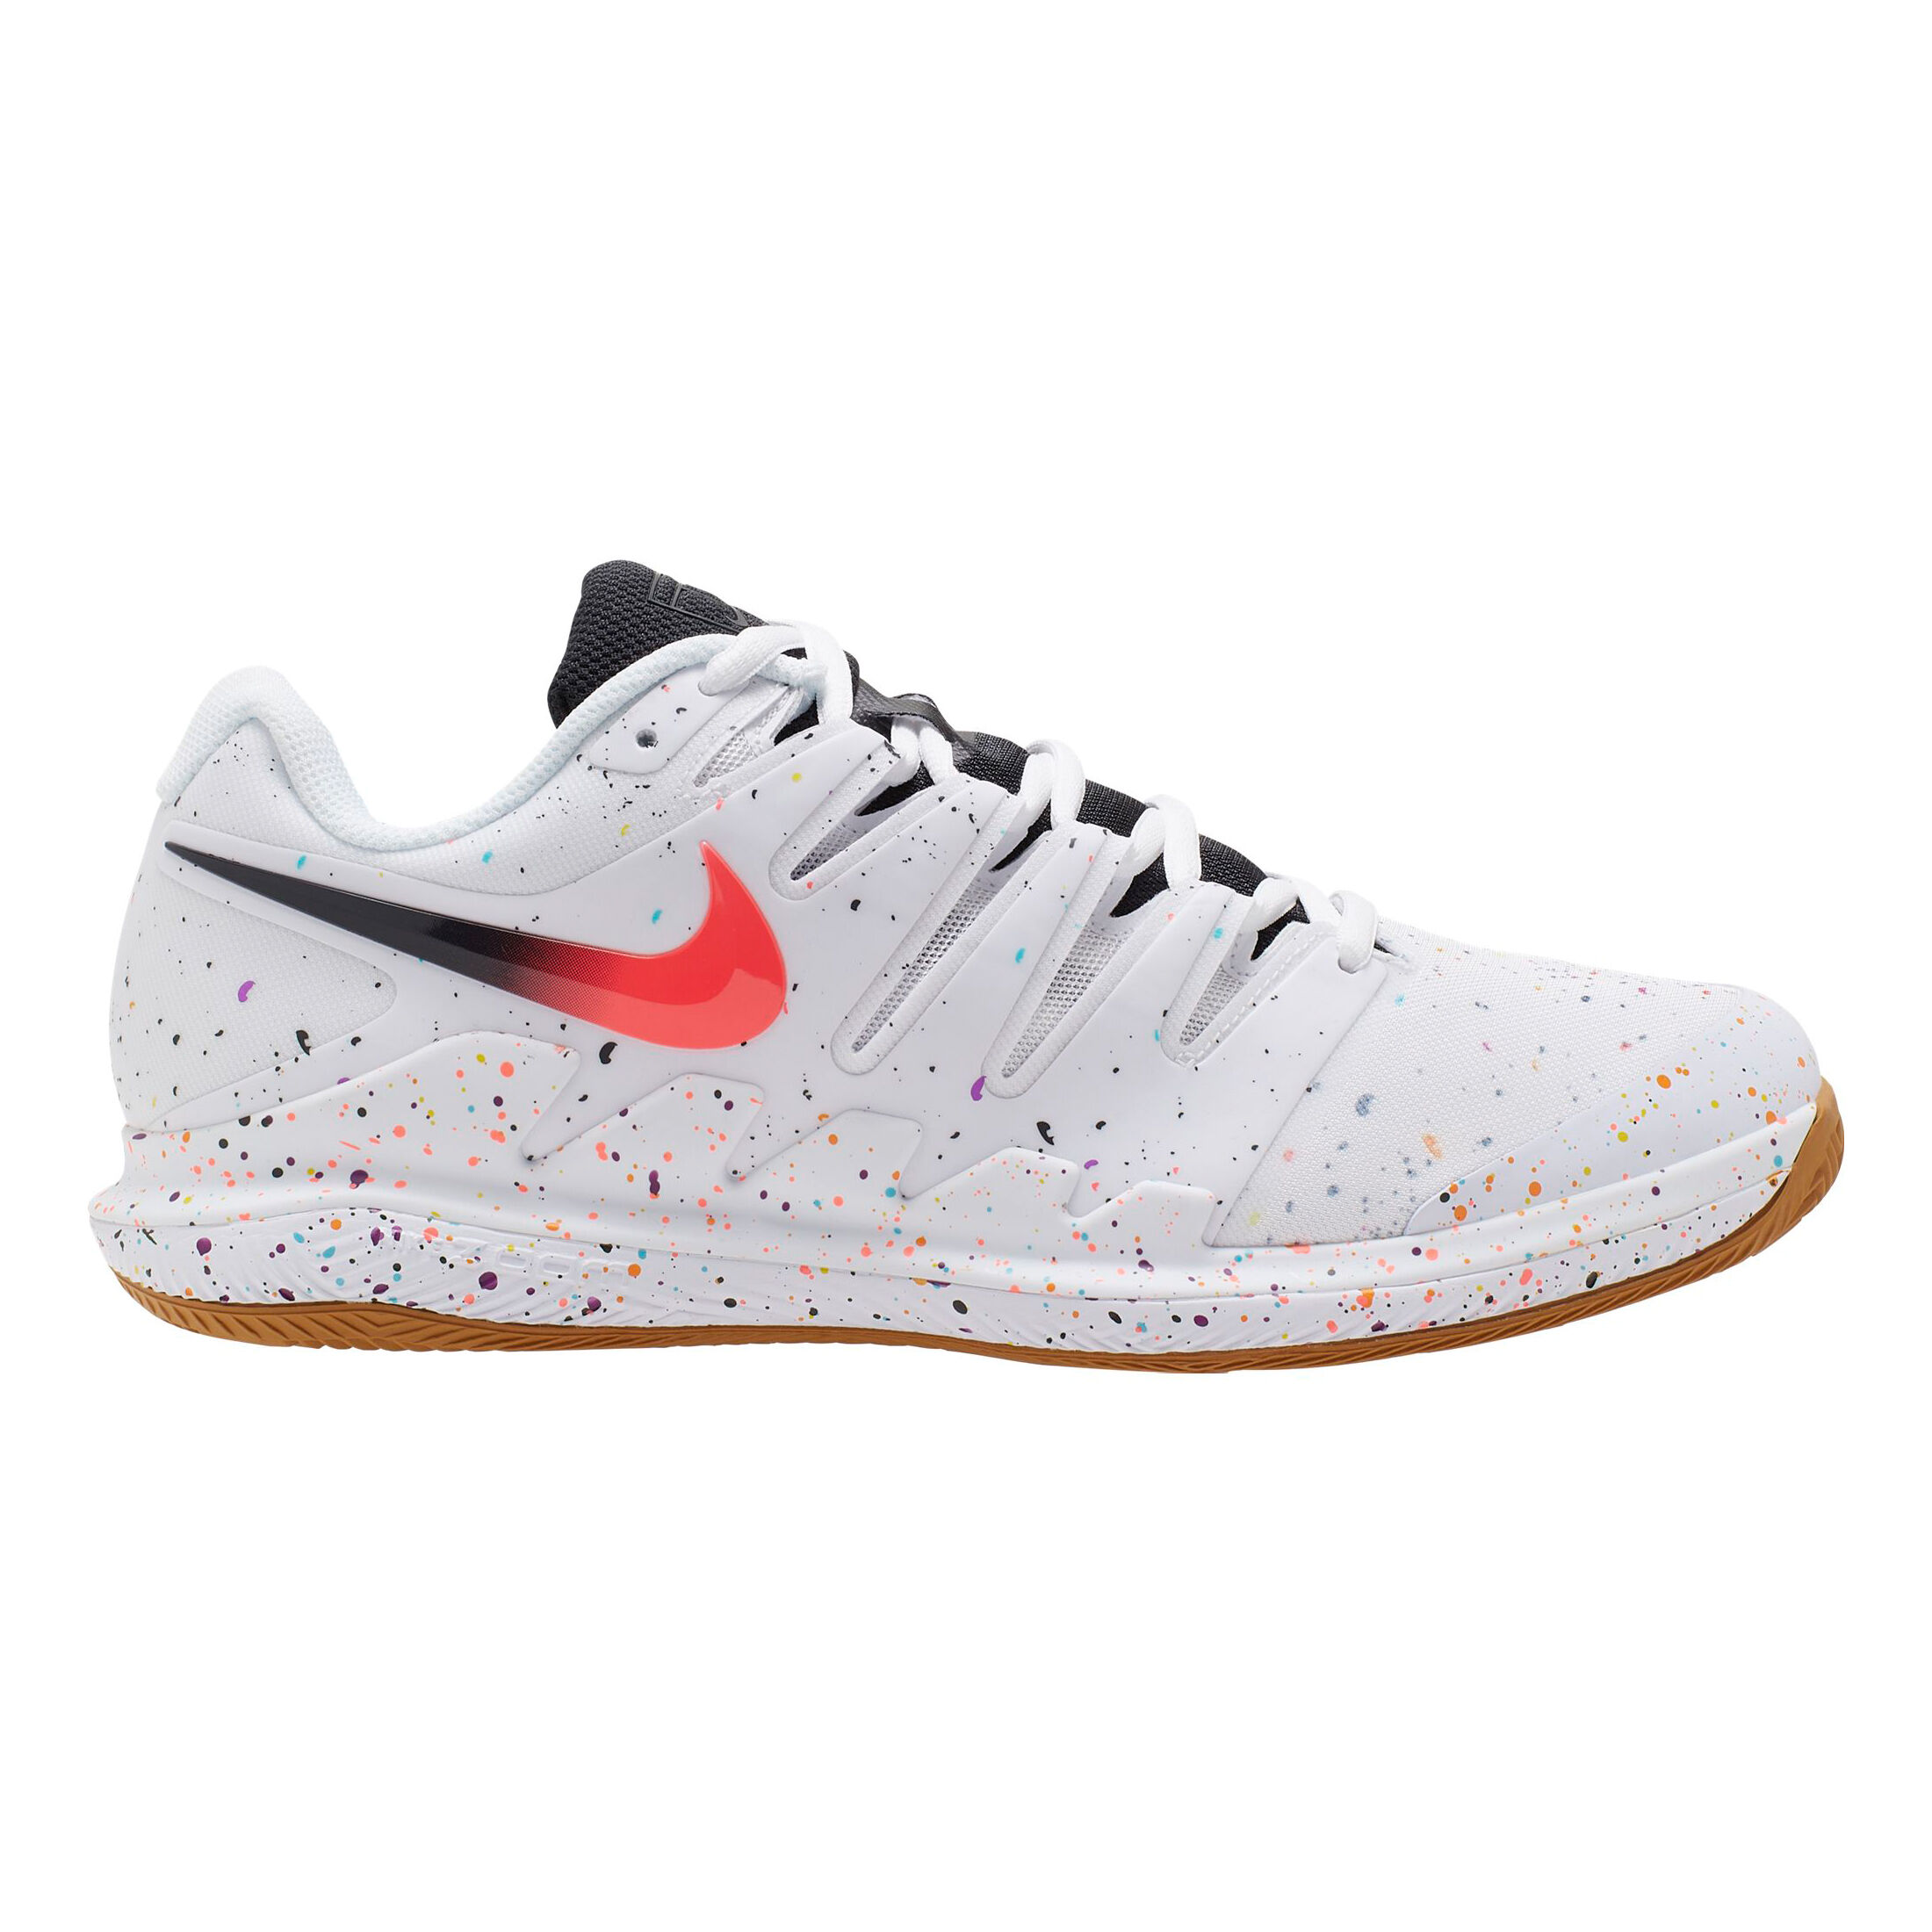 AO Nike Athletes Air Zoom Vapor X Sandplatzschuh Herren Weiß, Schwar